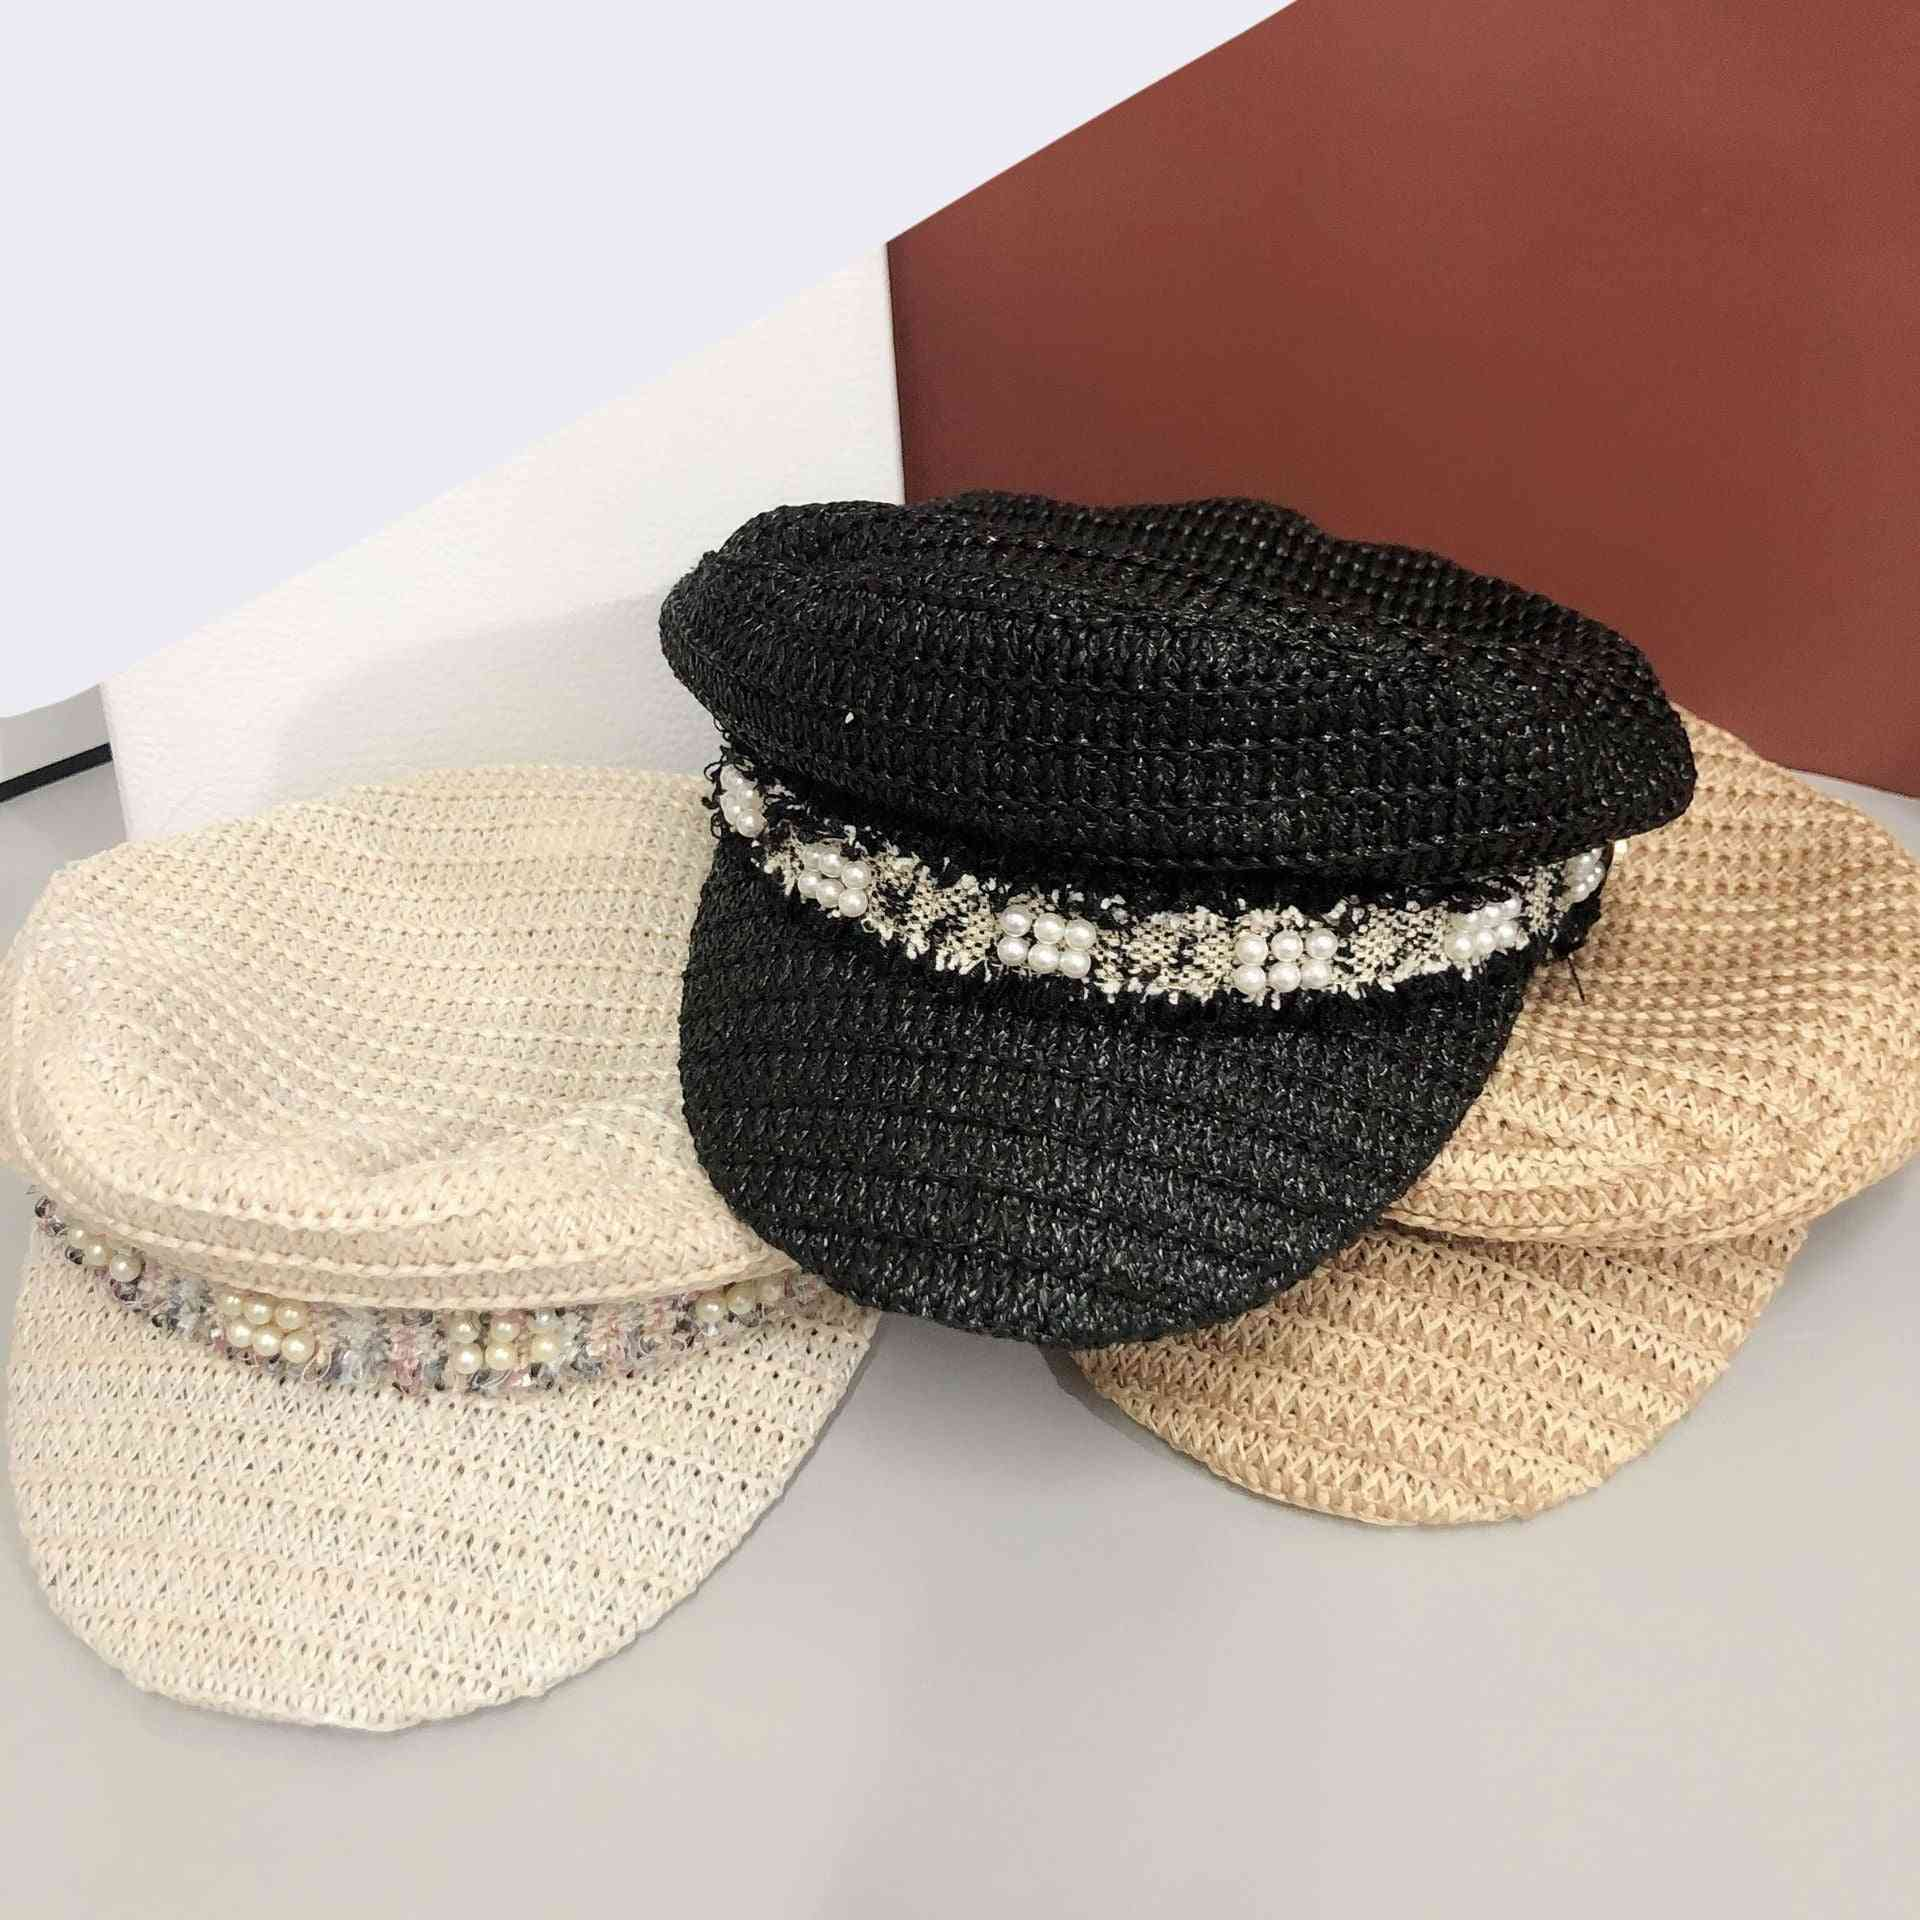 Straw Weaving Ventilation Pearl Ribbon Street Leisure Women Hat, Leisure Visors Cap